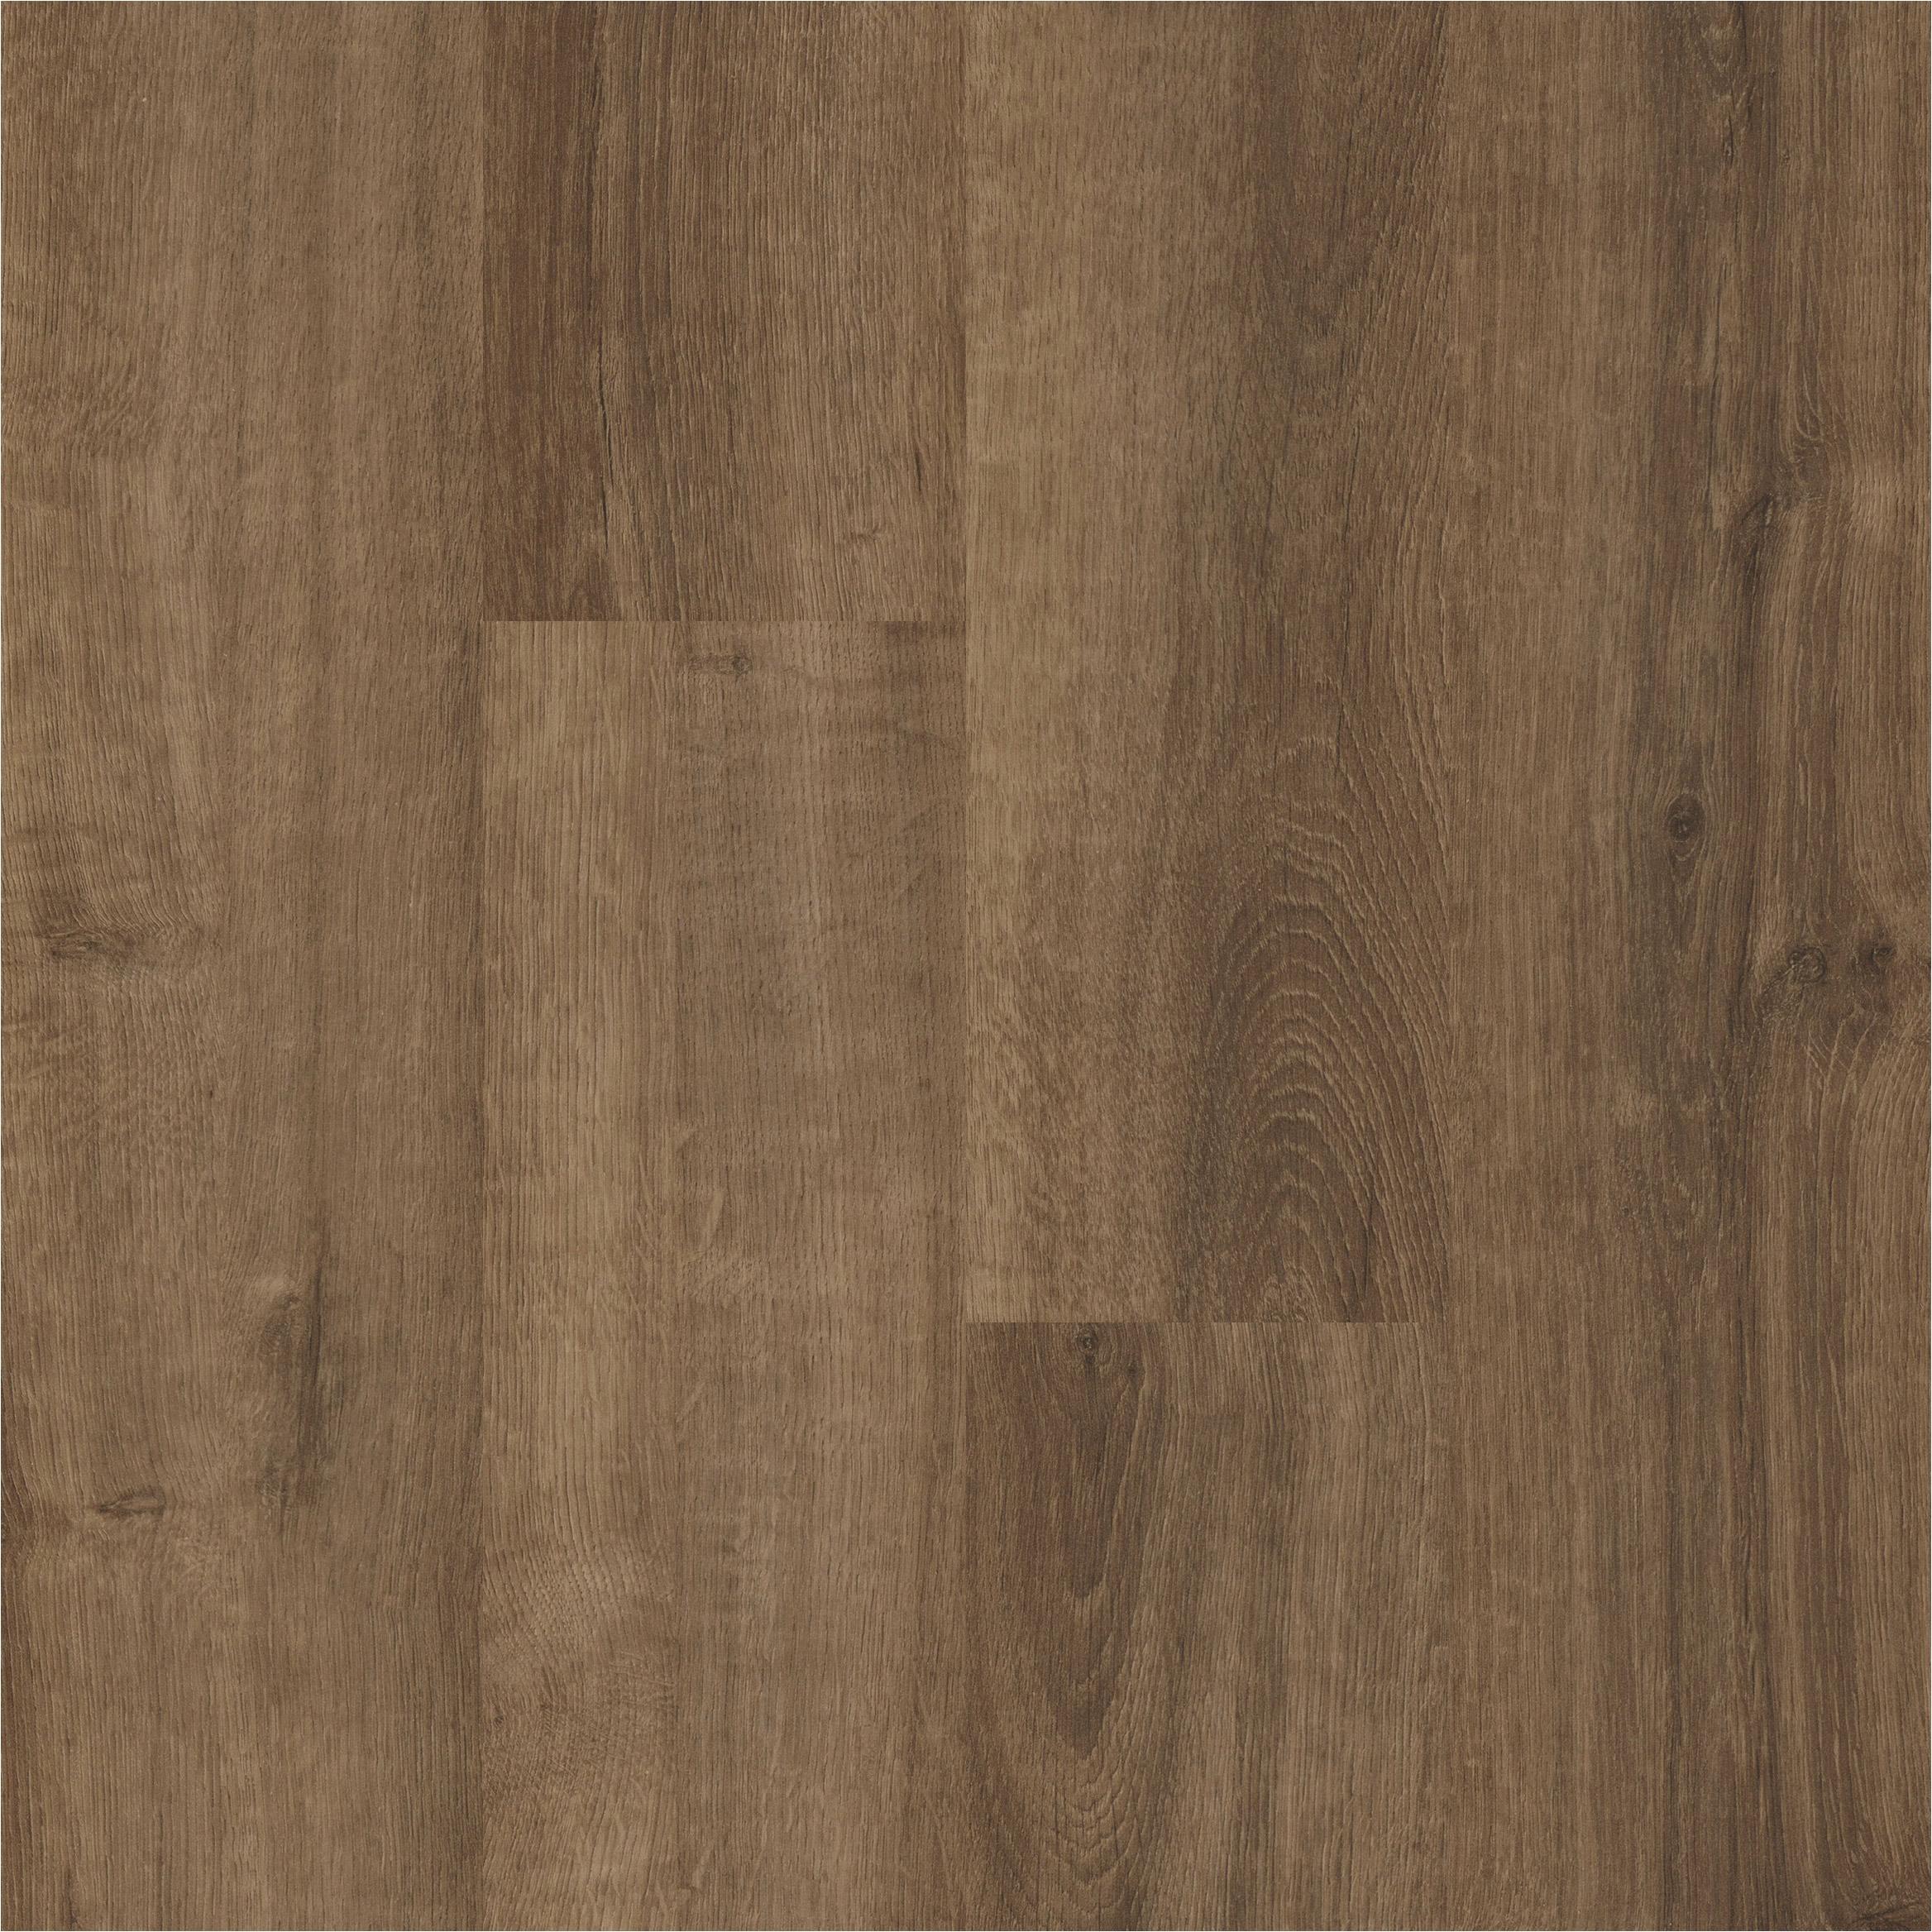 Click Together Vinyl Flooring BradsHomeFurnishings - Click in place vinyl flooring